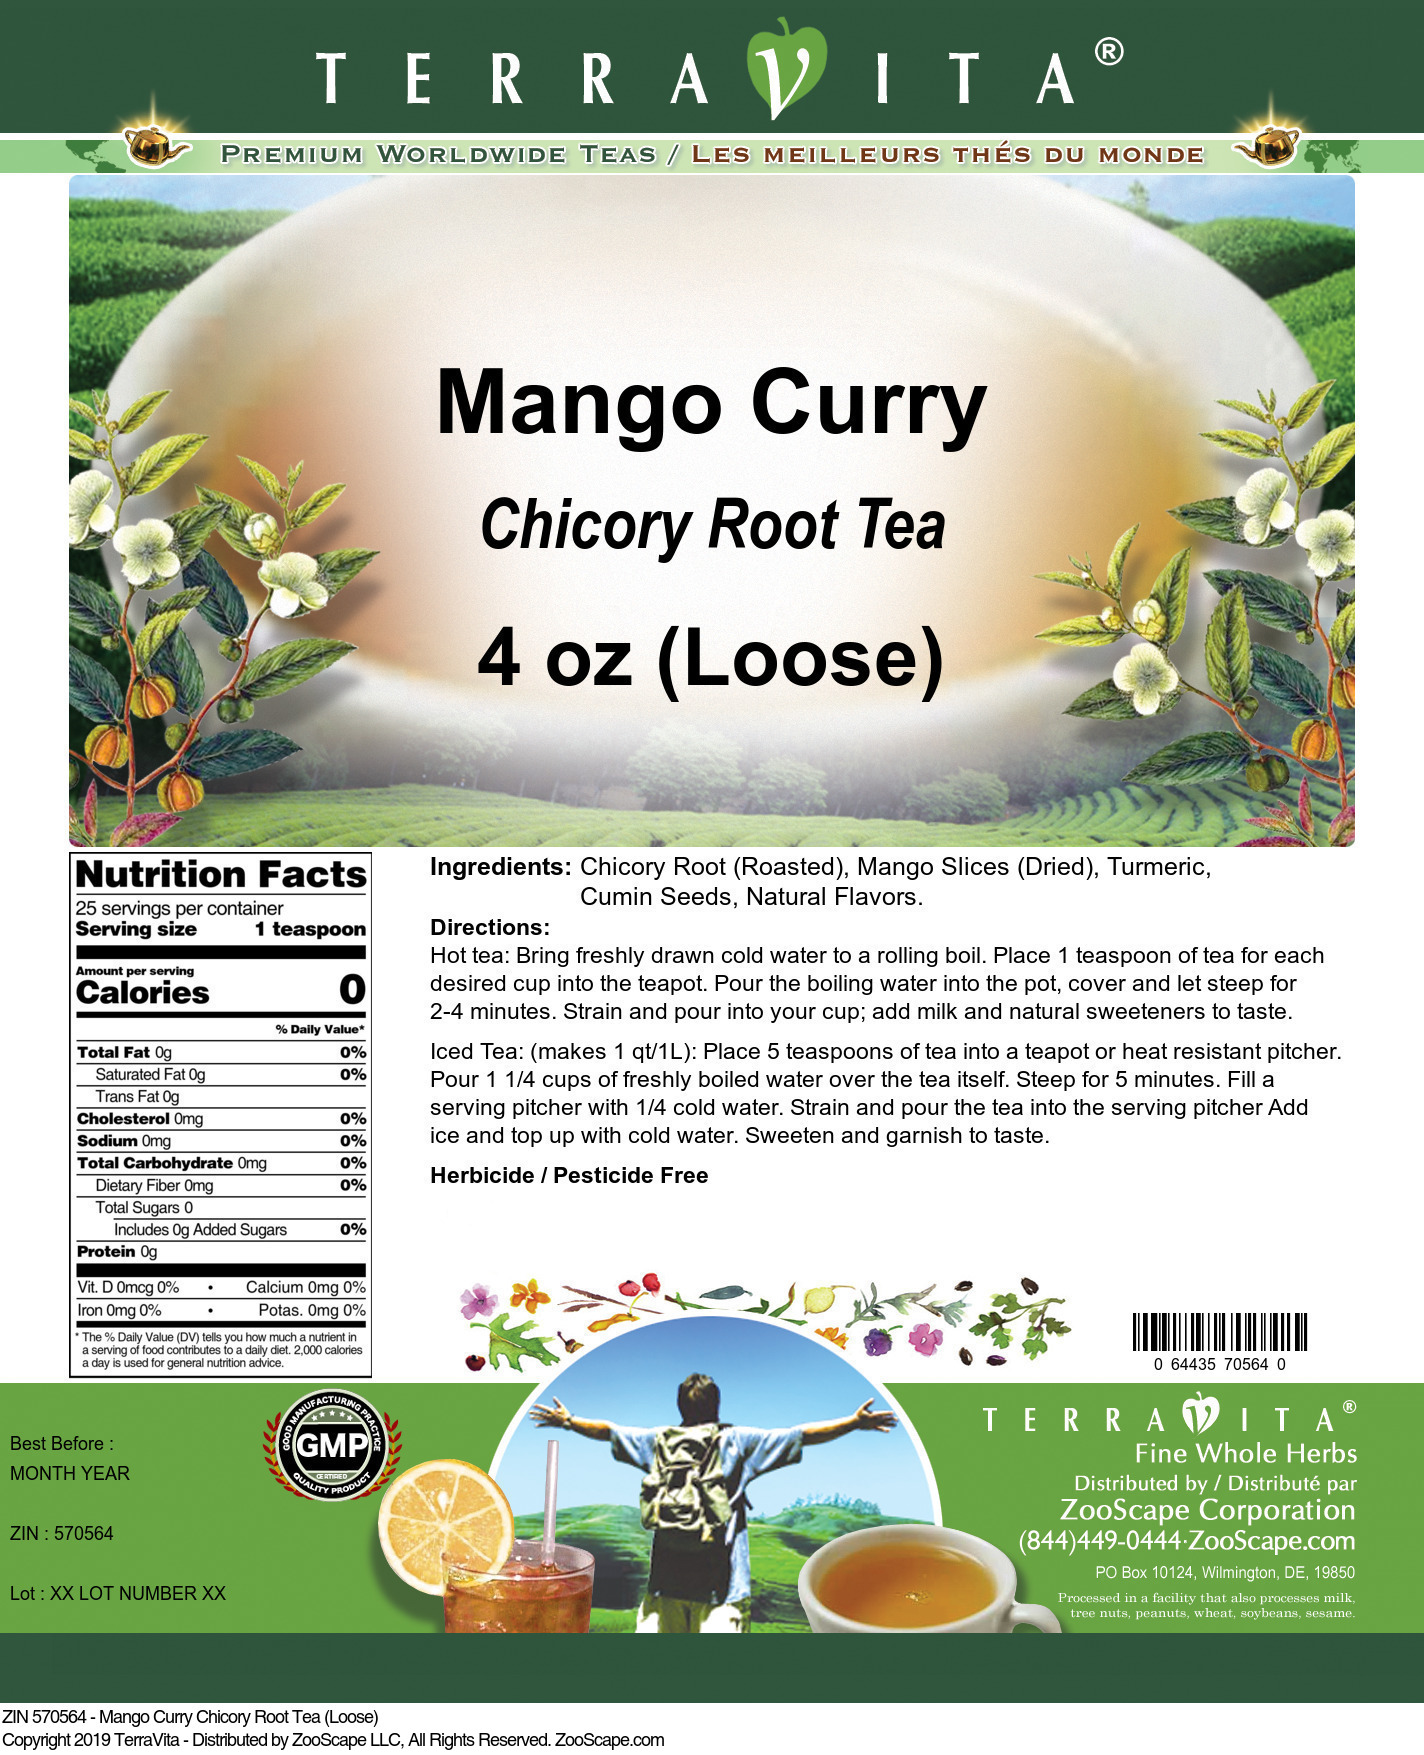 Mango Curry Chicory Root Tea (Loose)